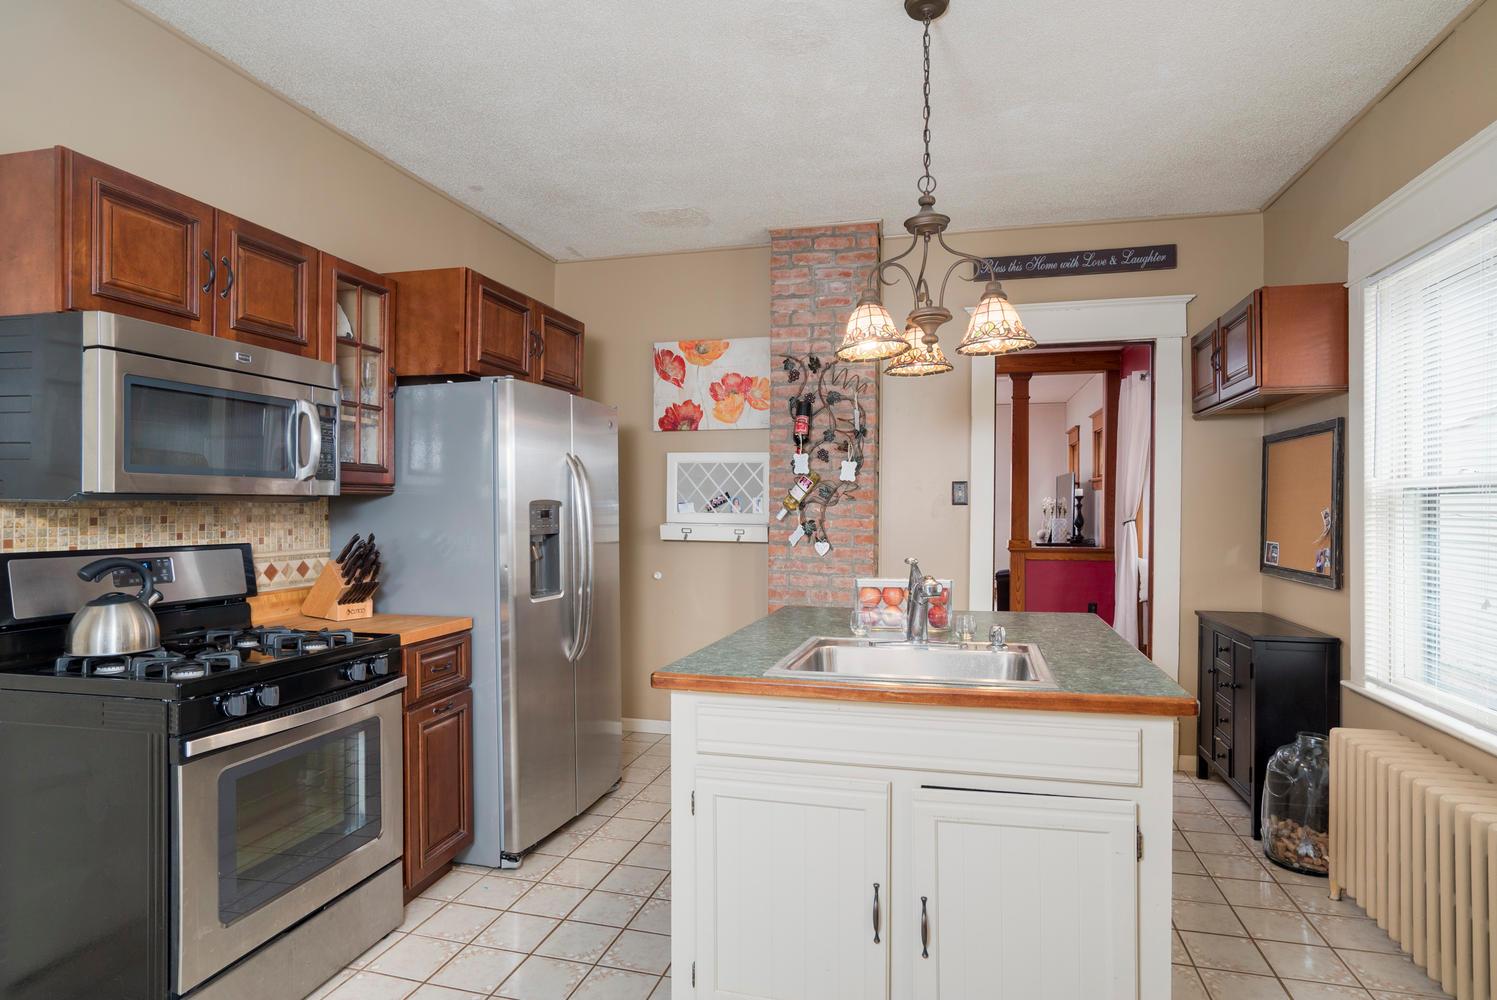 55 Benson Ave Buffalo NY 14224-large-009-10-Kitchen-1498x1000-72dpi